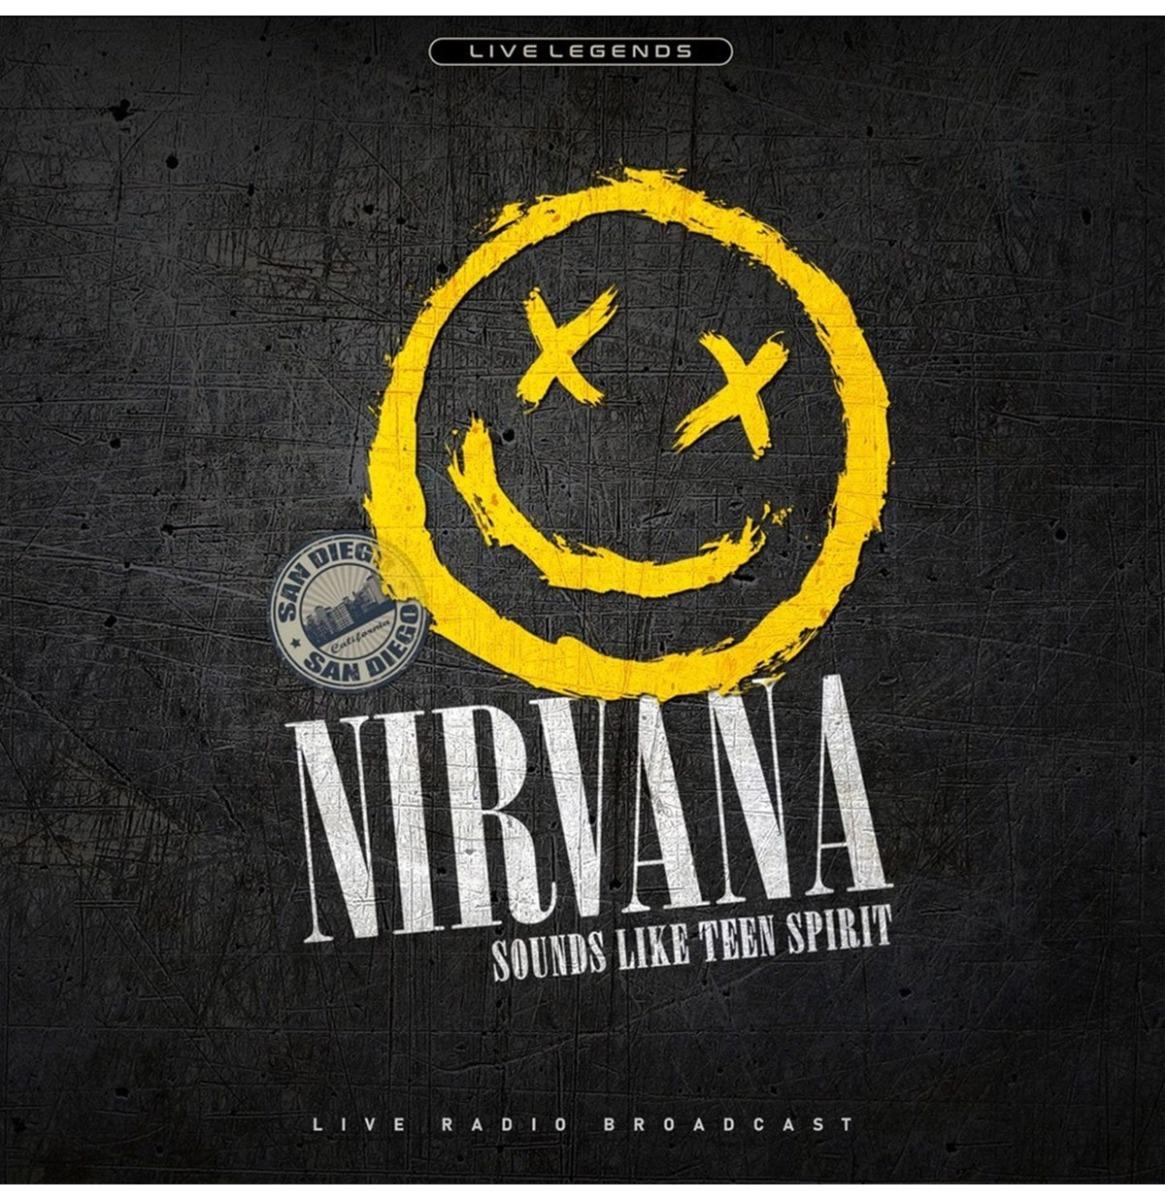 Nirvana - Sounds Like Teen Spirit (Geel Vinyl) LP